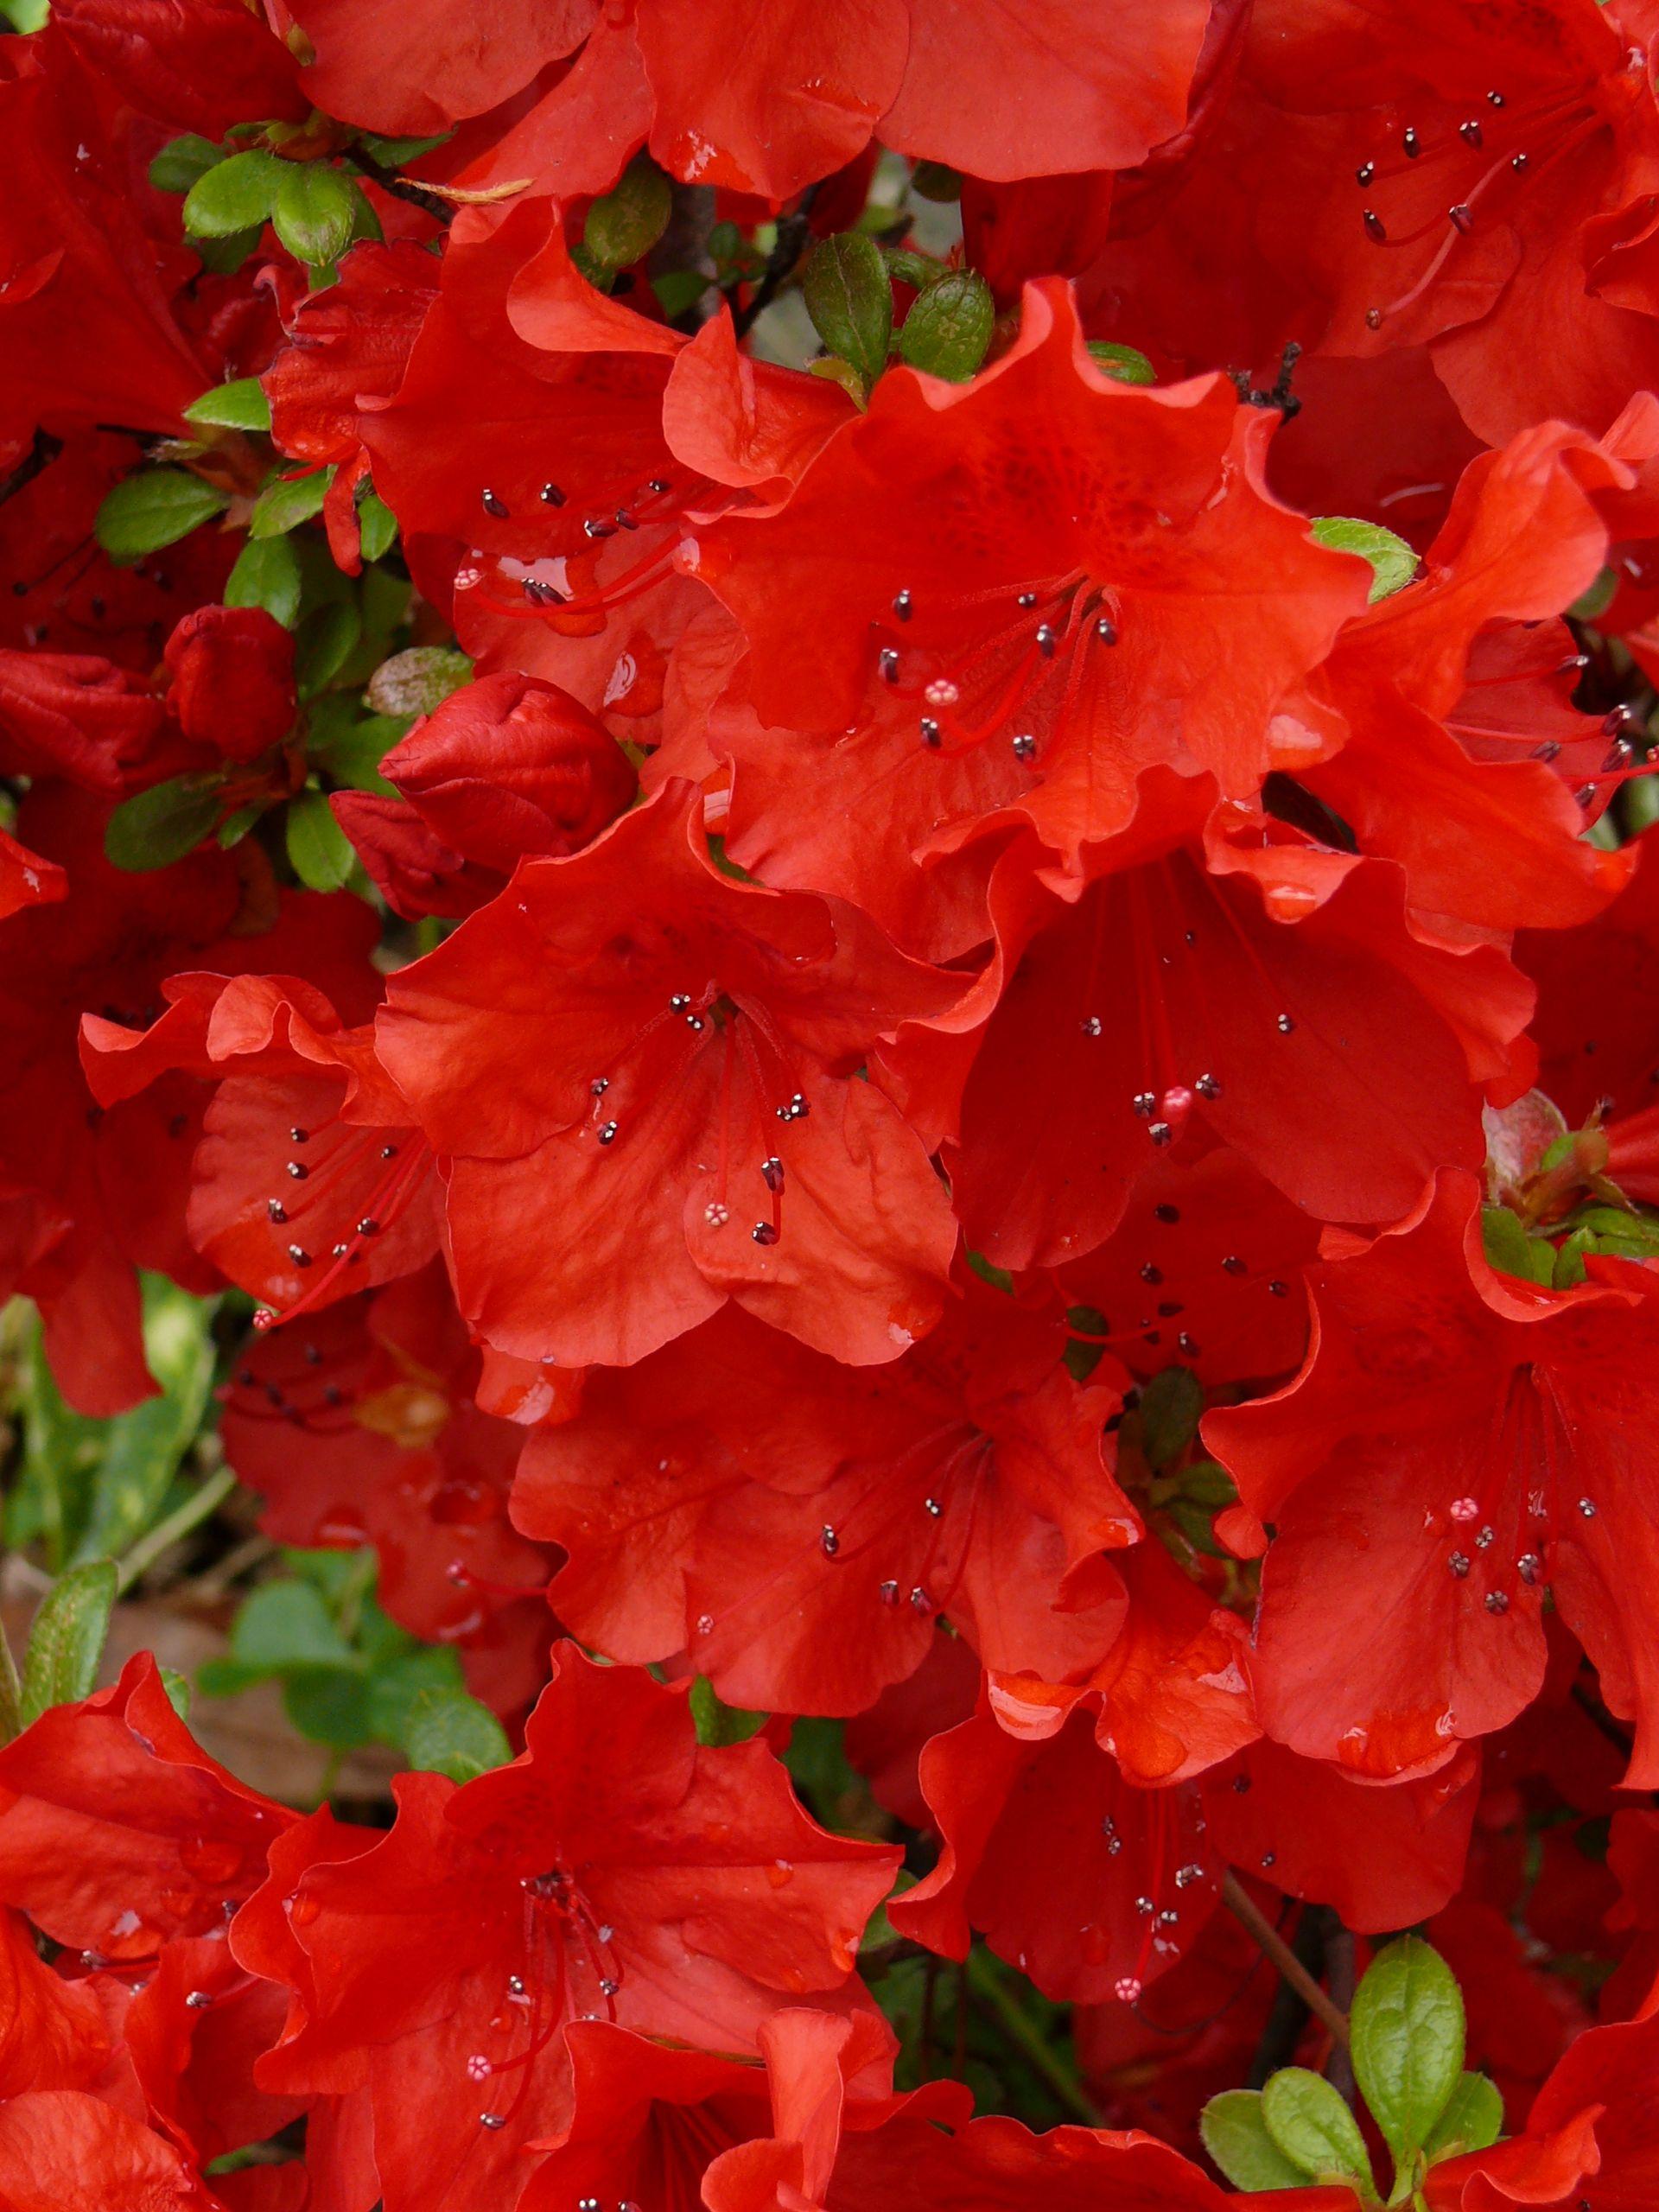 Rhododendron washington state flower r e d pinterest flower